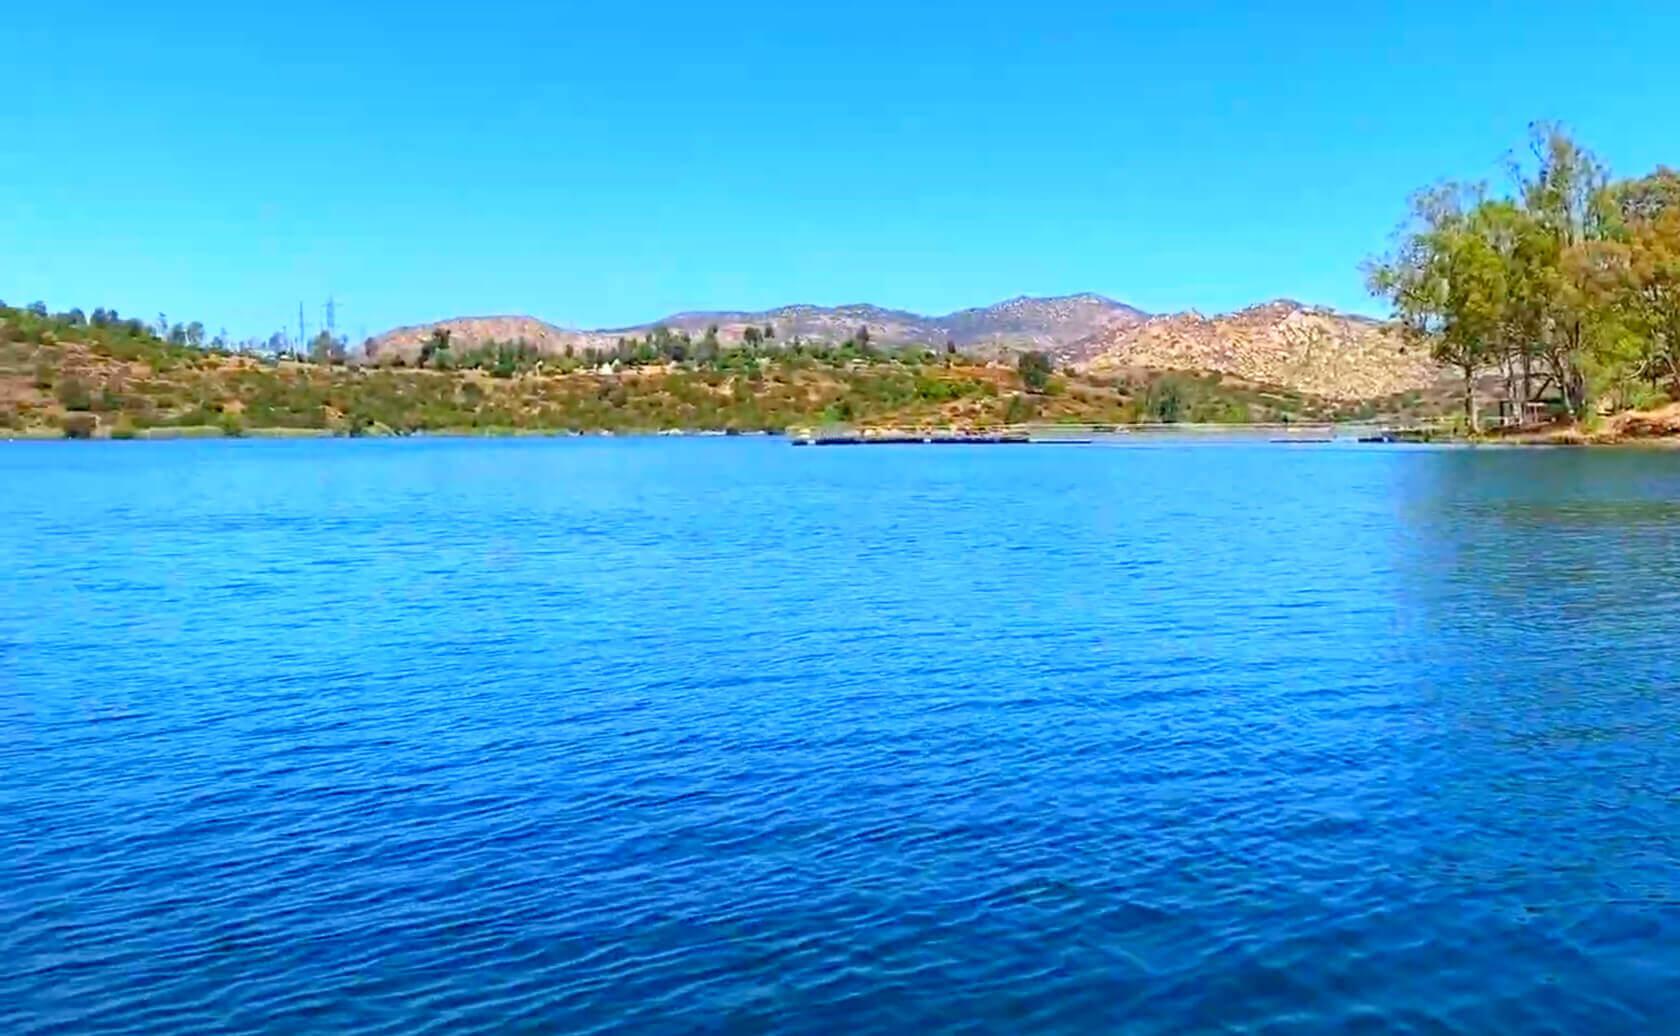 Jennings-Lake-Fishing-Guide-Report-Lakeside-CA-01